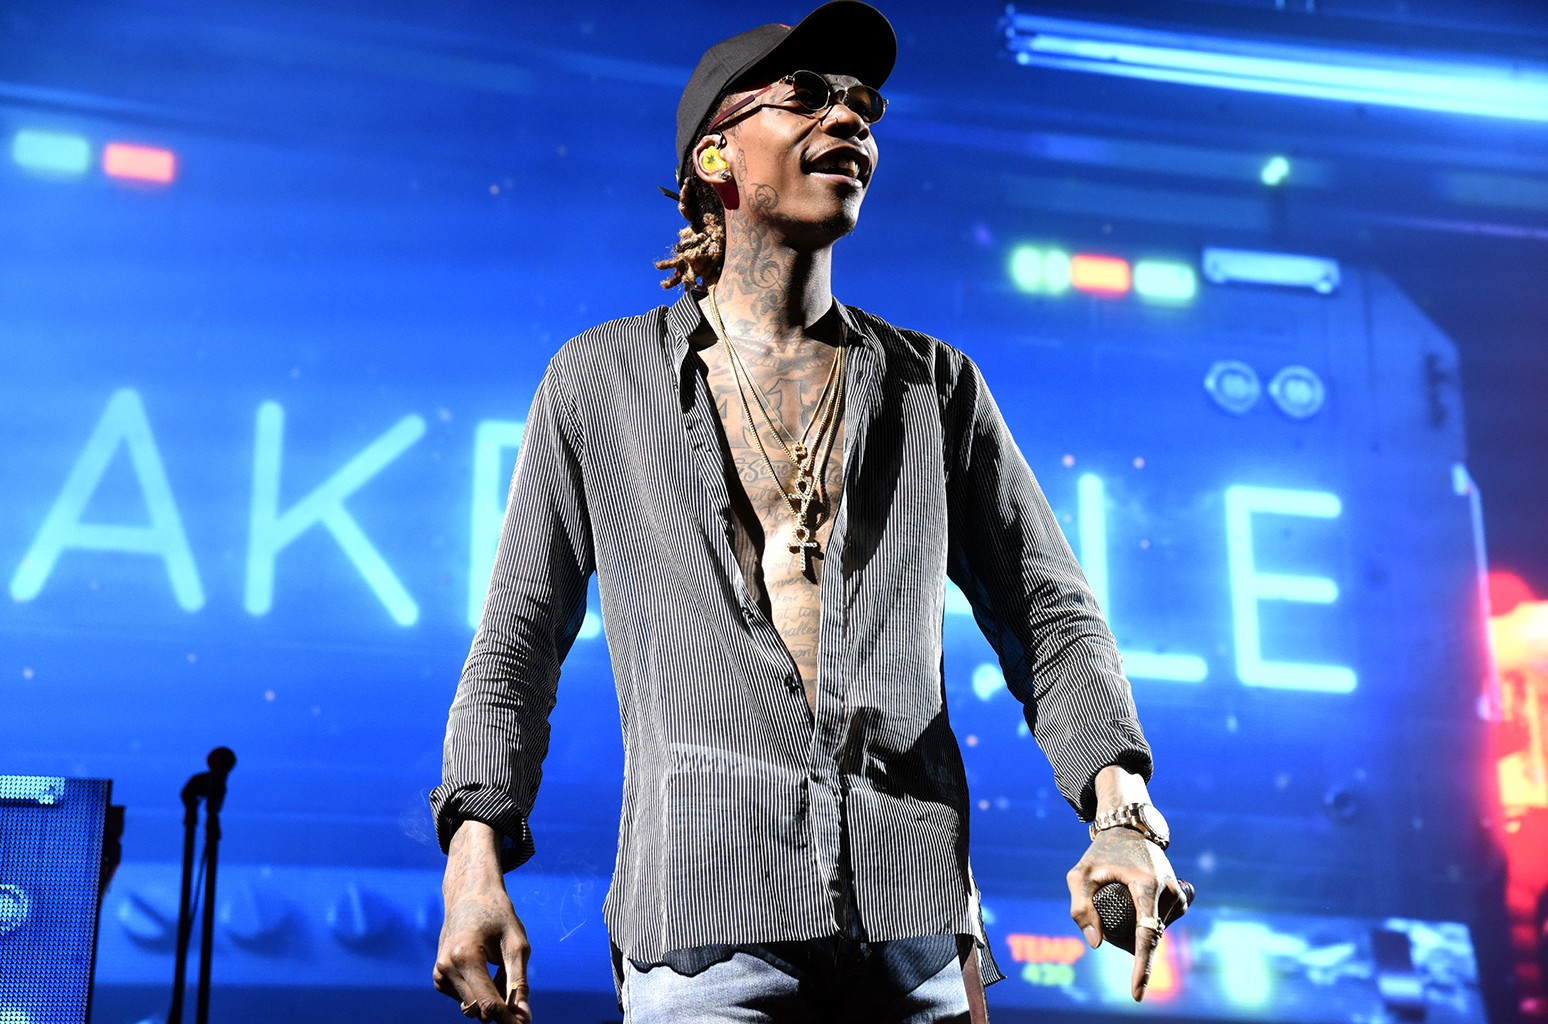 Wiz Khalifa performs at Concord Pavilion